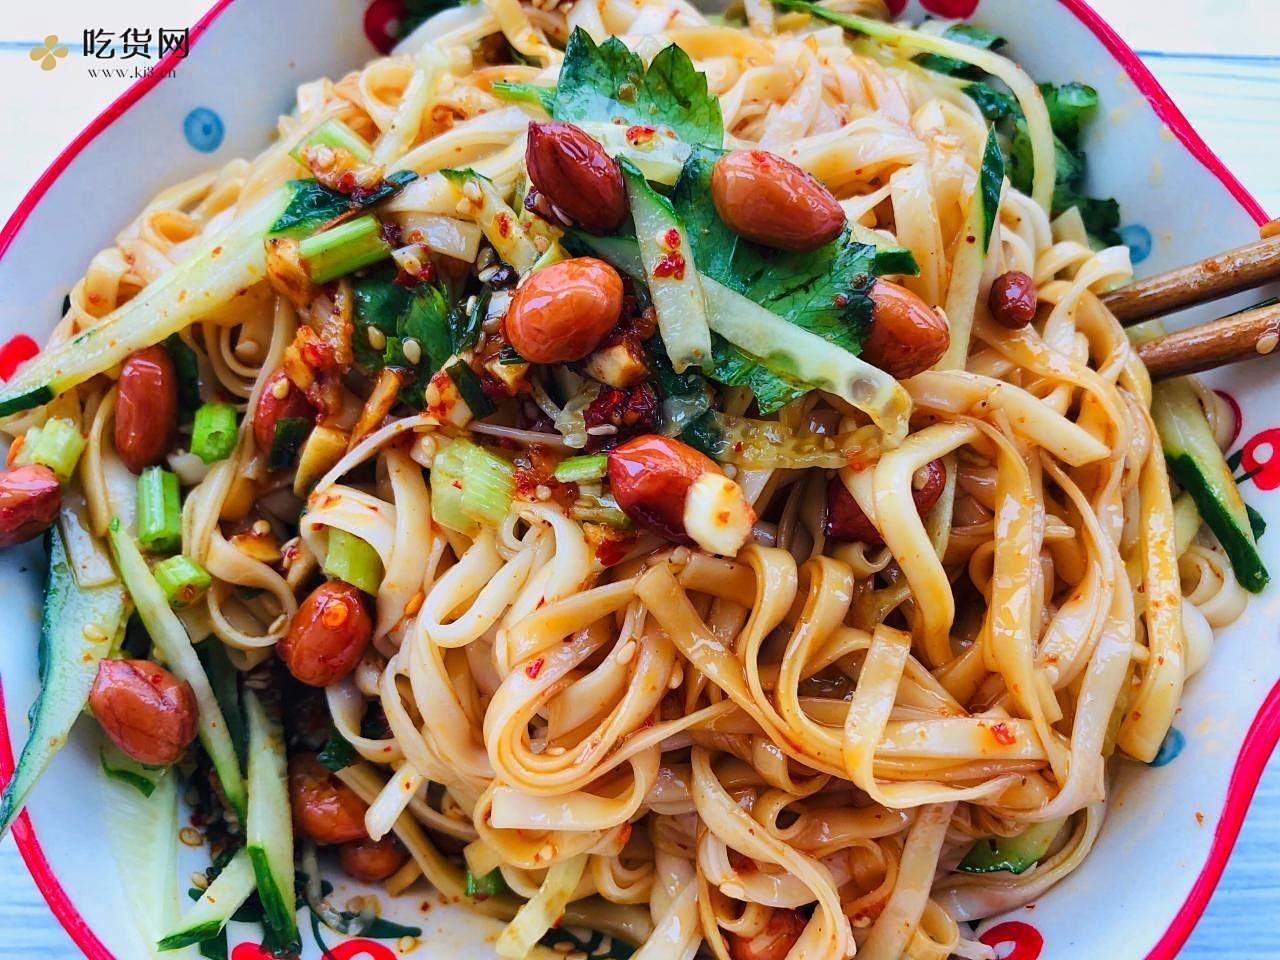 ❗️酸爽开胃㊙️酸辣凉拌面🍜零厨艺食谱的做法 步骤3